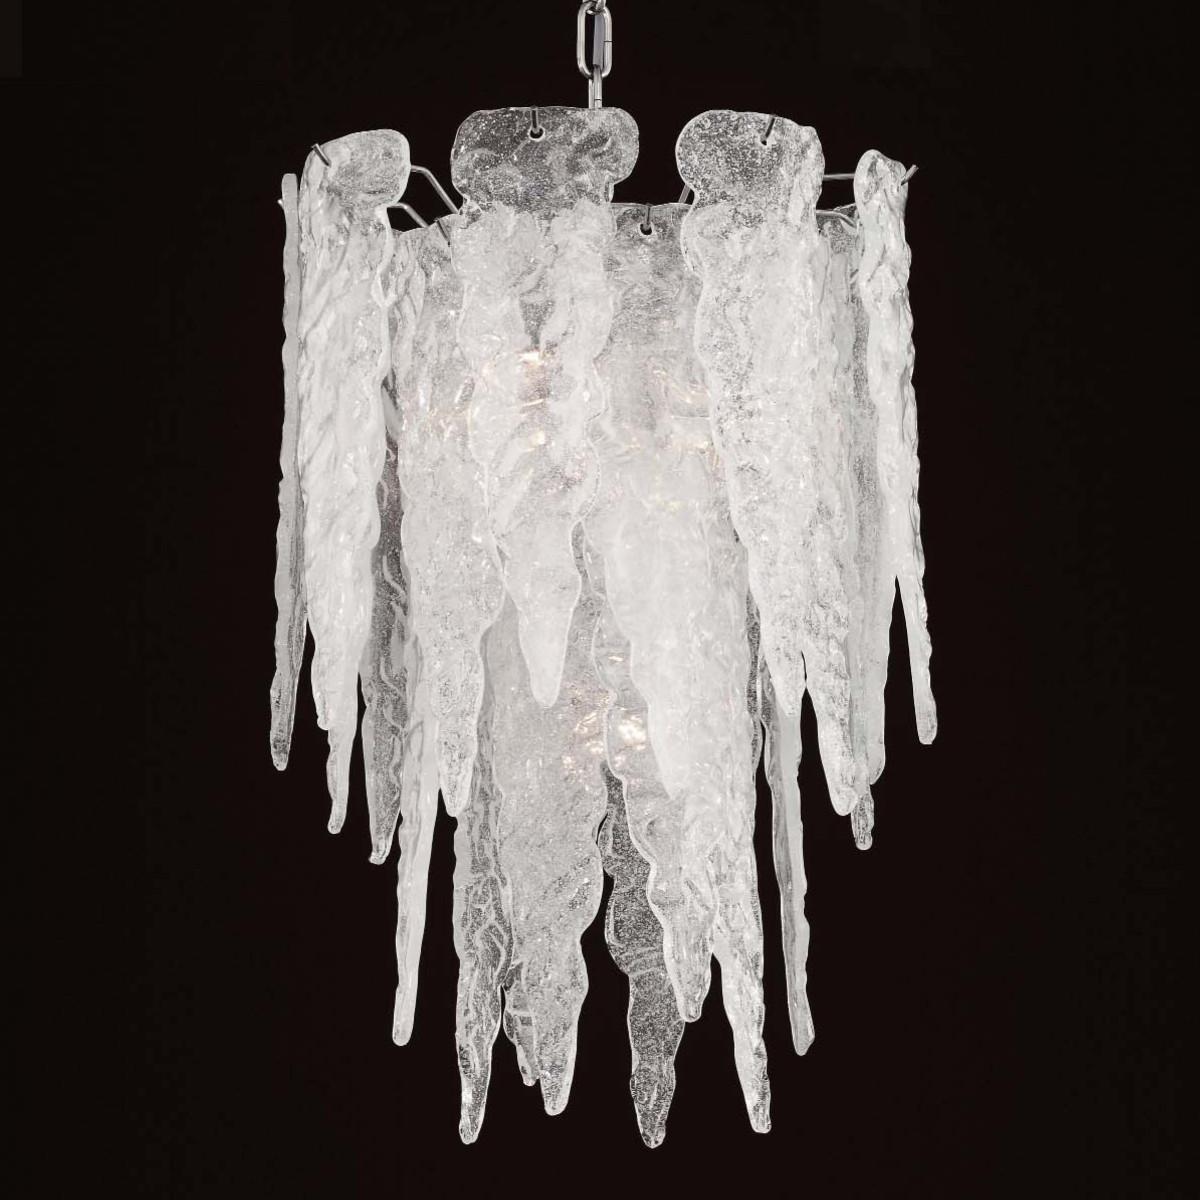 """Stalattite"" Murano glass chandelier - 4 lights"